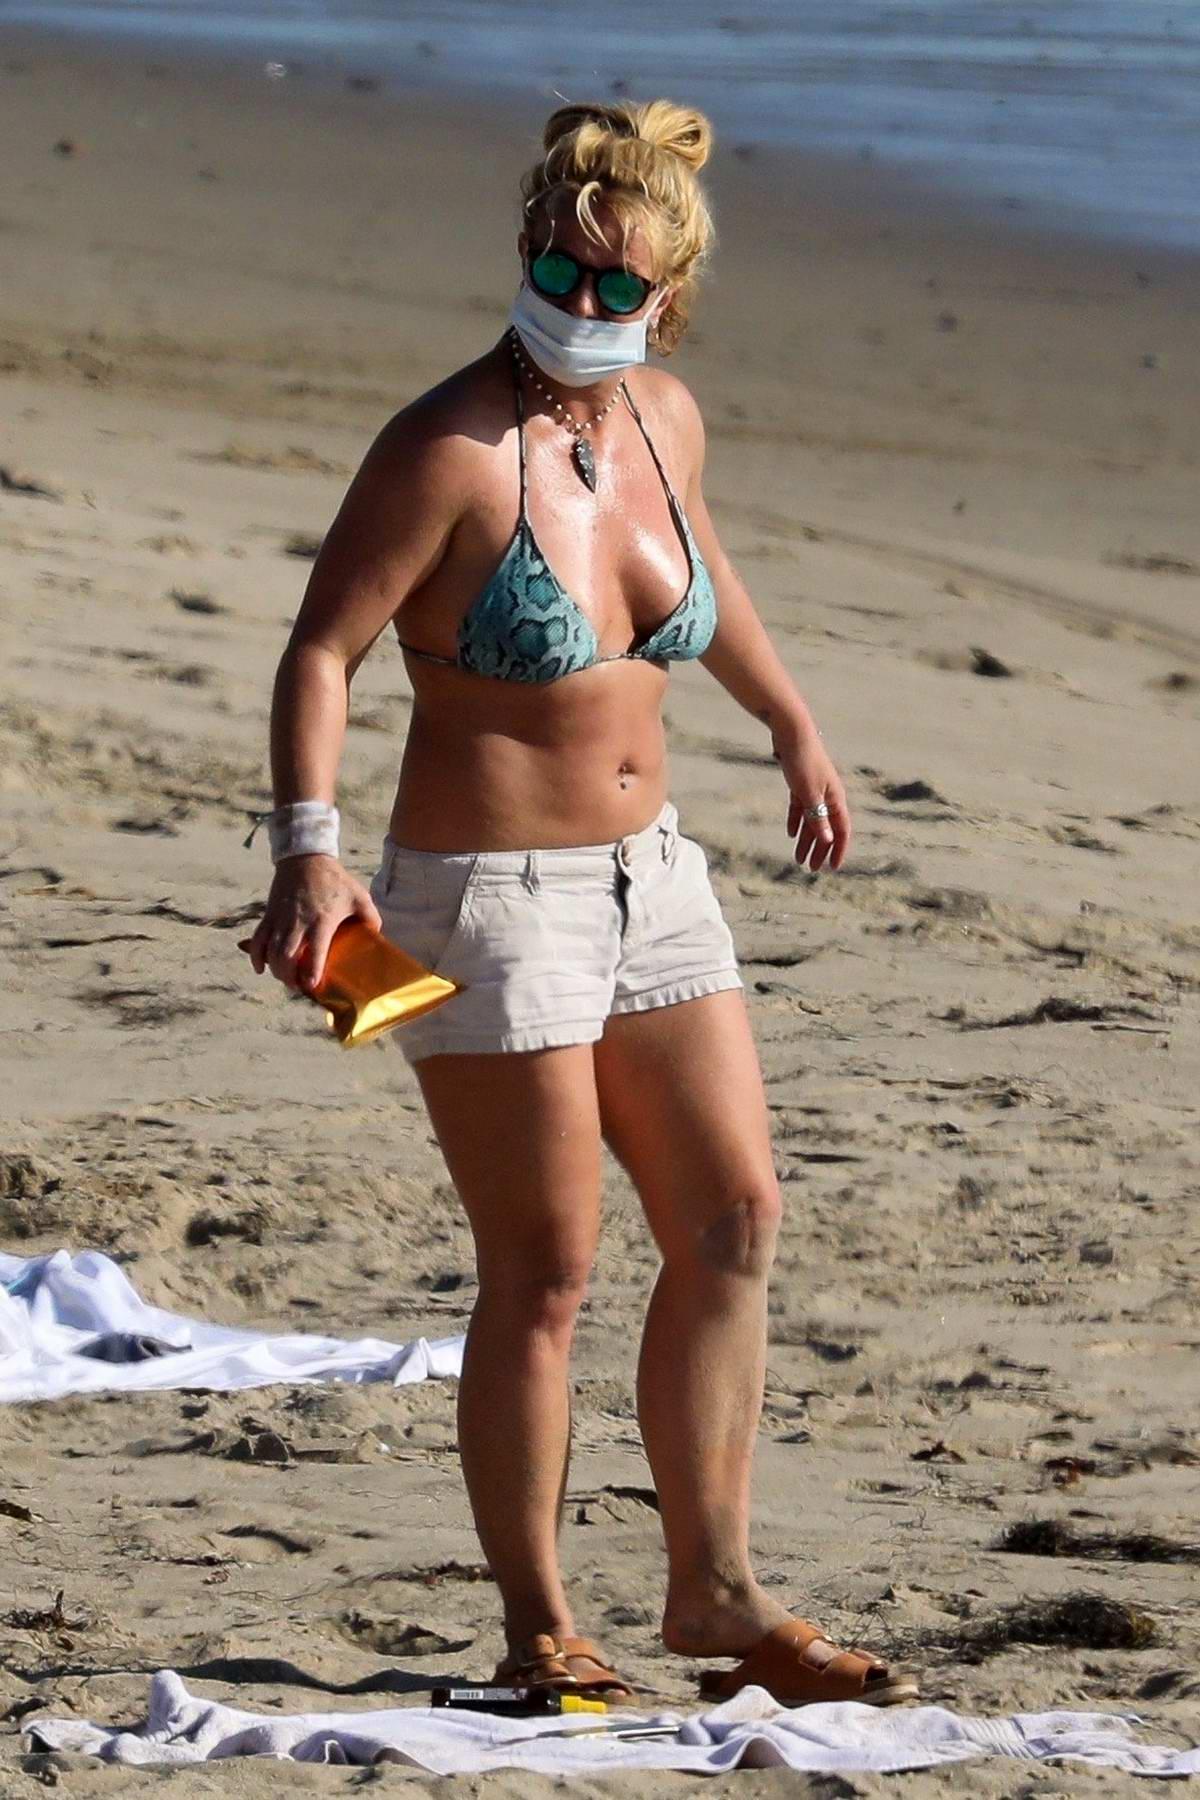 Britney Spears soaks up the sun in a bikini during beach day in Malibu, California